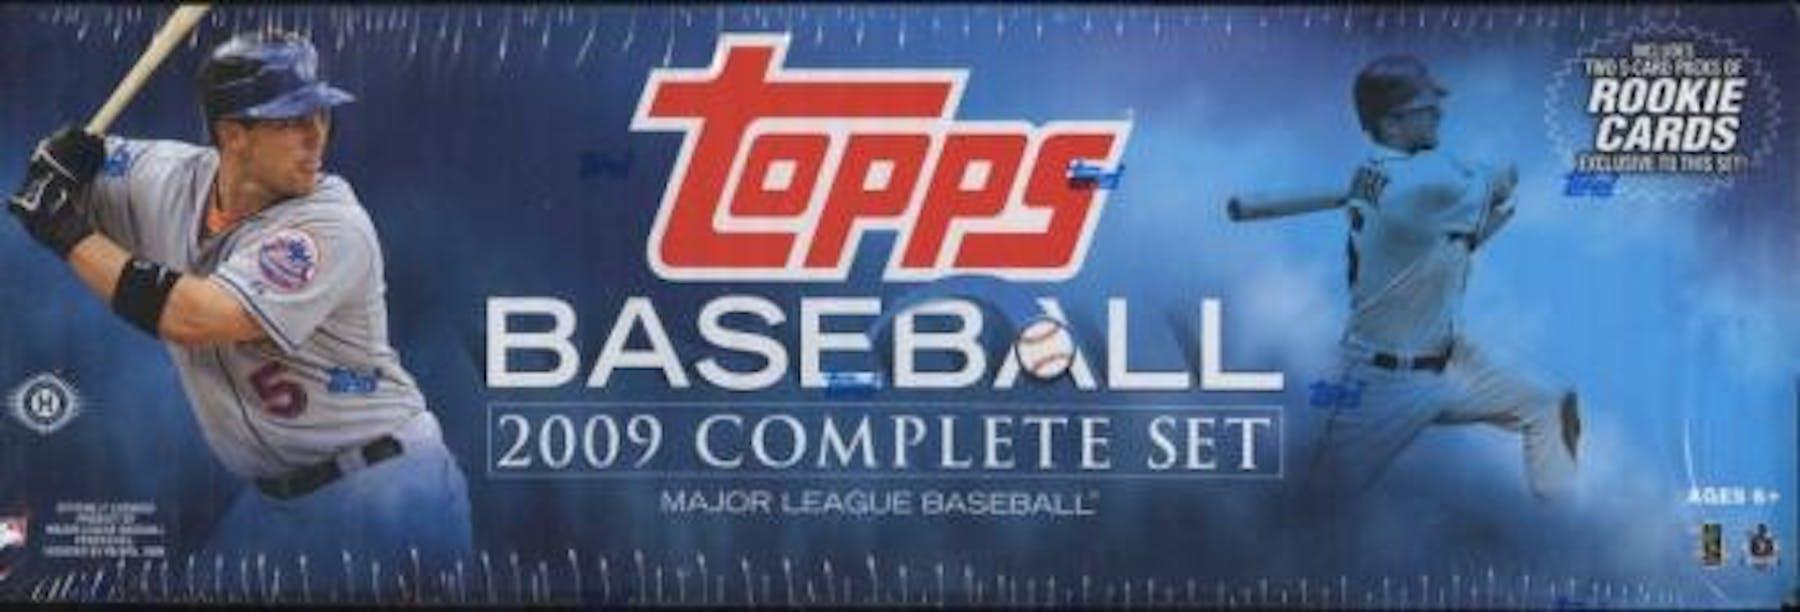 2009 Topps Factory Set Baseball Hobby Box Da Card World